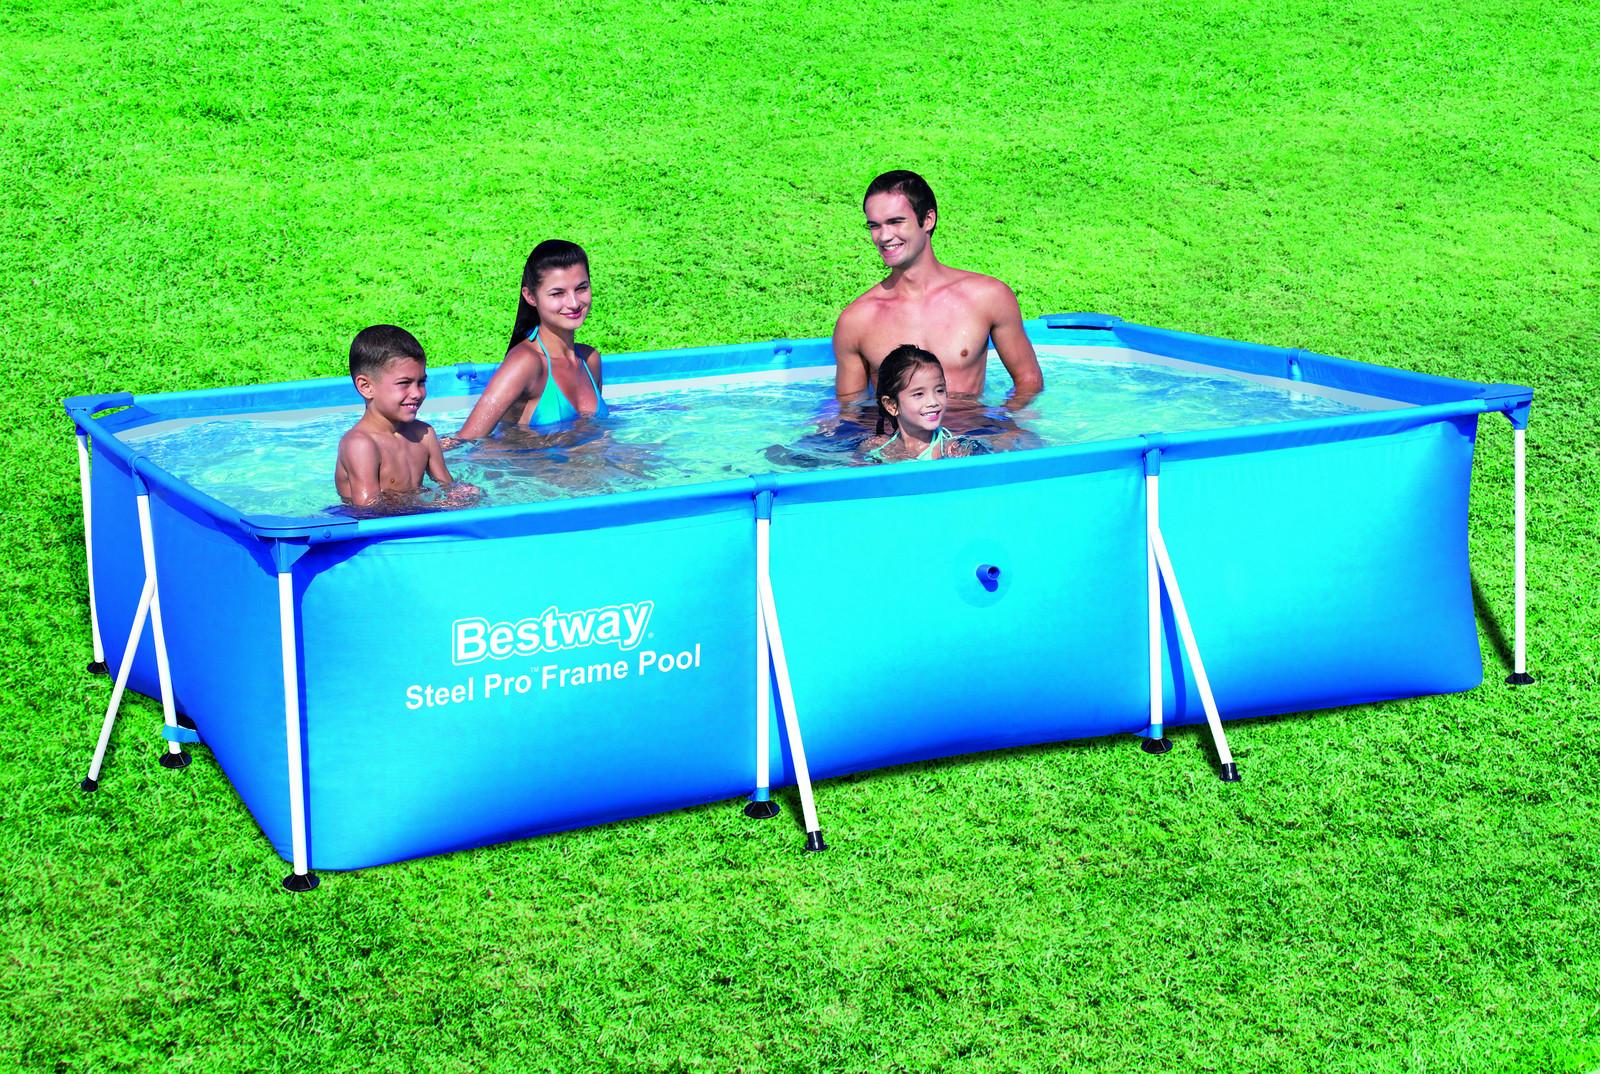 ᐈ bestway power pro frame pool 3.00m x 2.01m x 66cm - blue kaufen